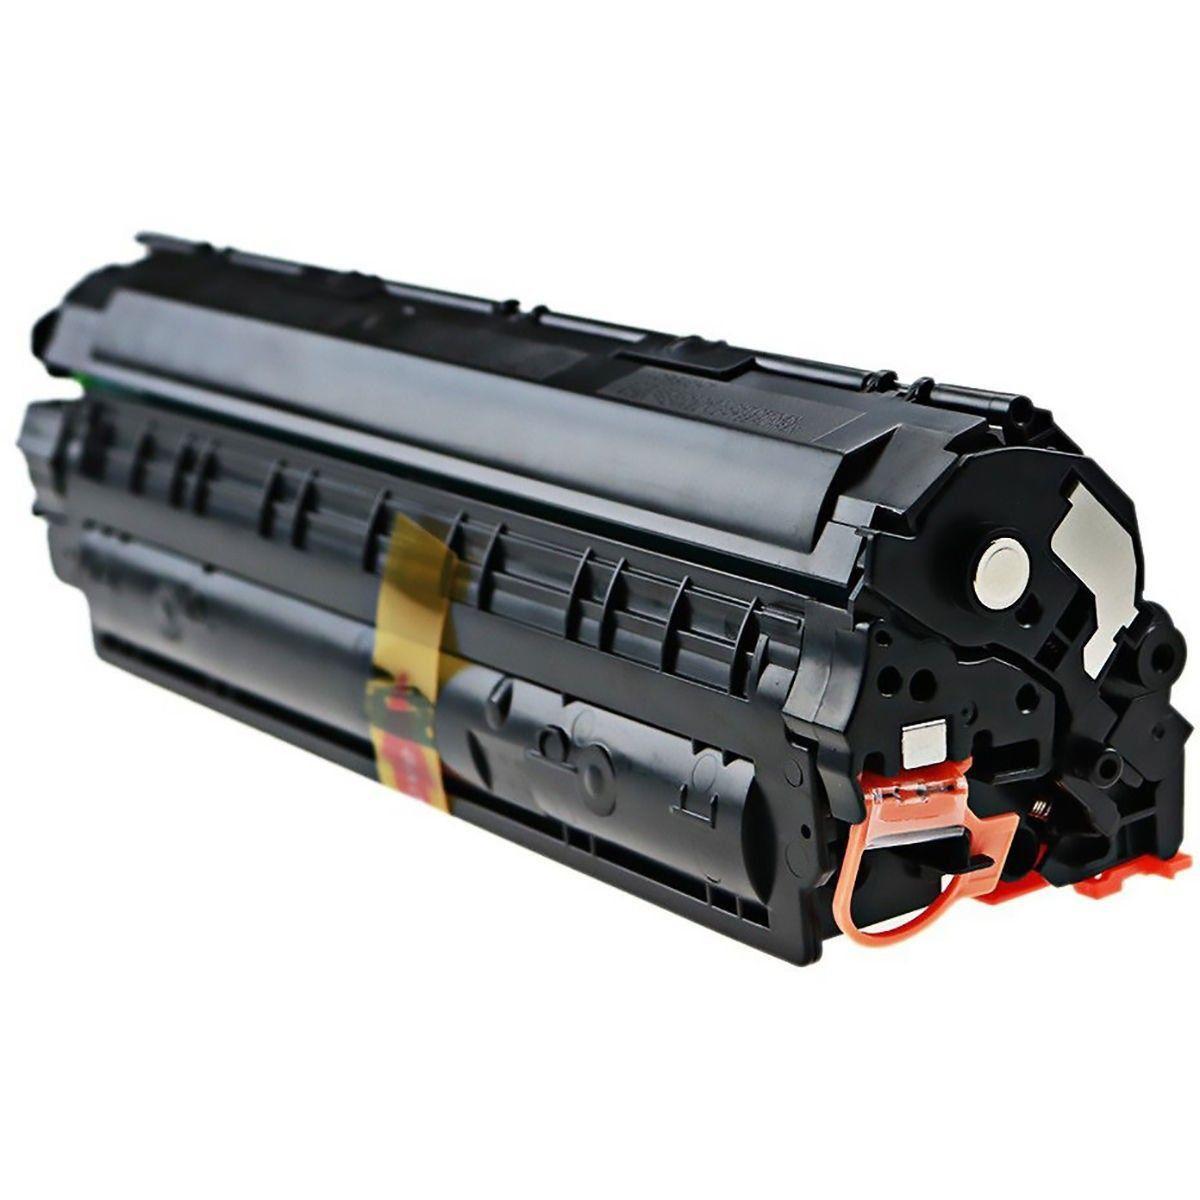 Compatível: Toner CE285A 85A para HP P1102 P1102w P1109 P1109w M1130 M1132 M1210 M1212 M1212nf M1217fw / Preto / 1.800